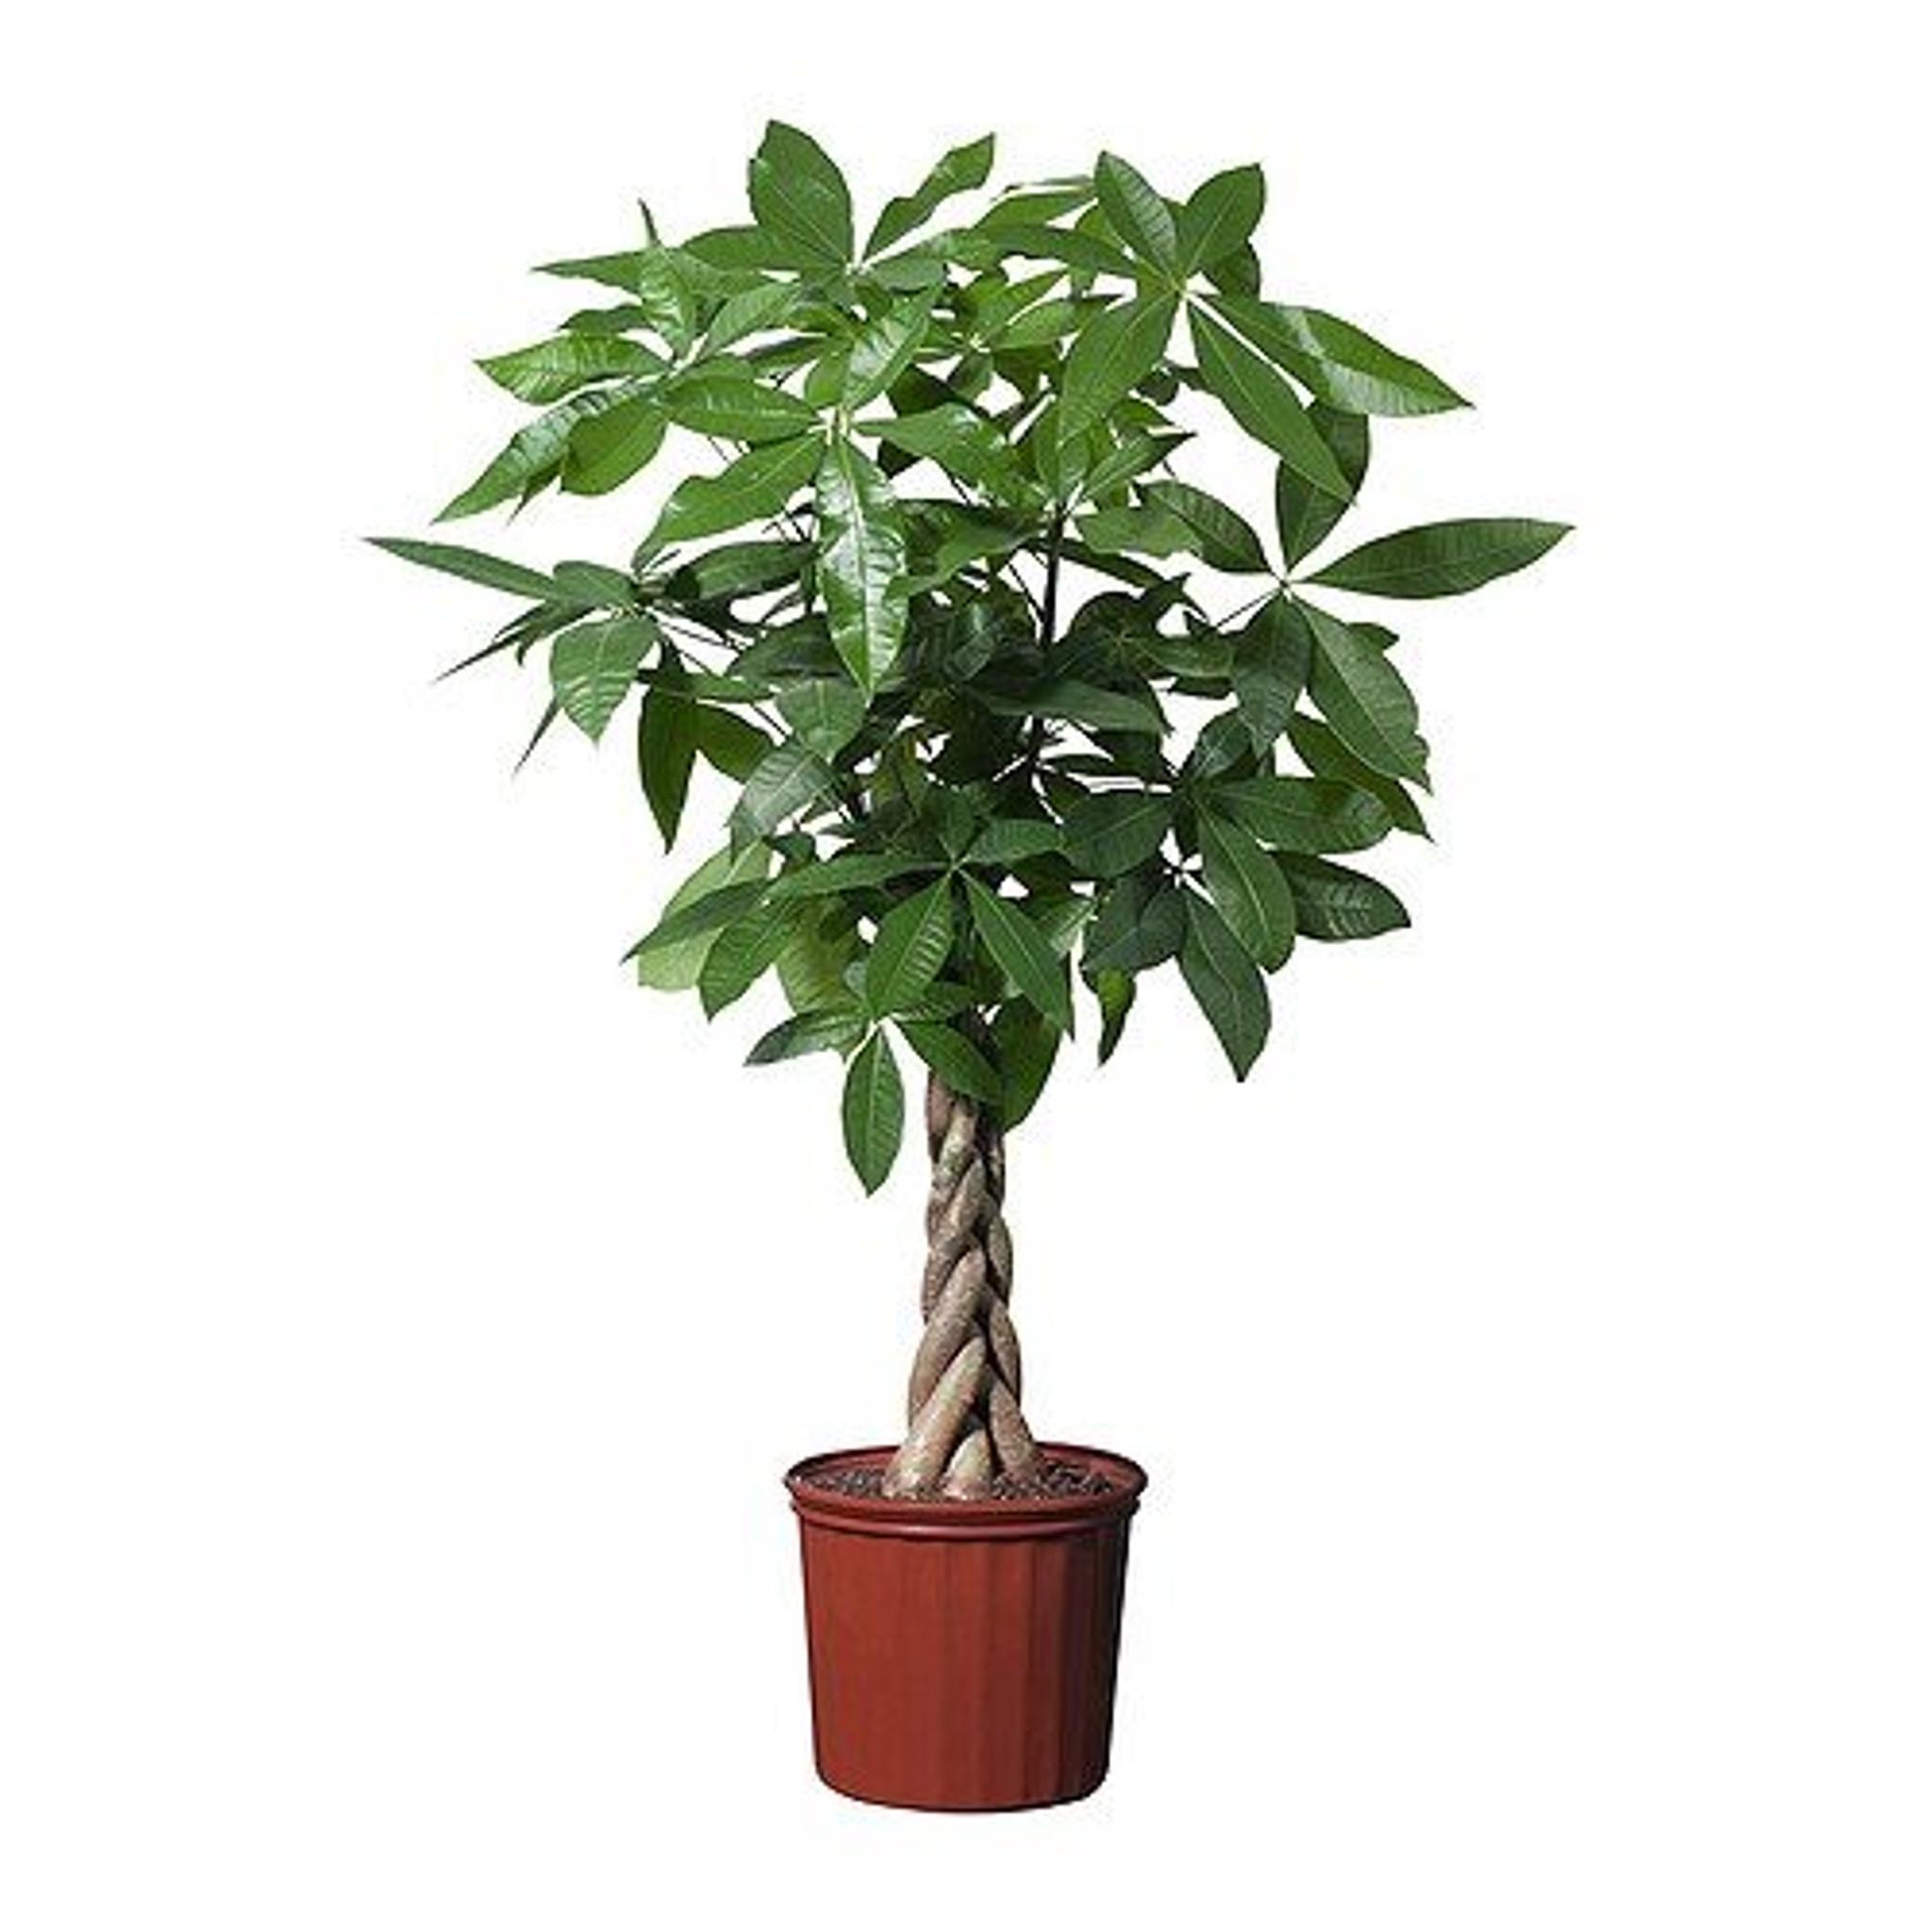 Small money tree